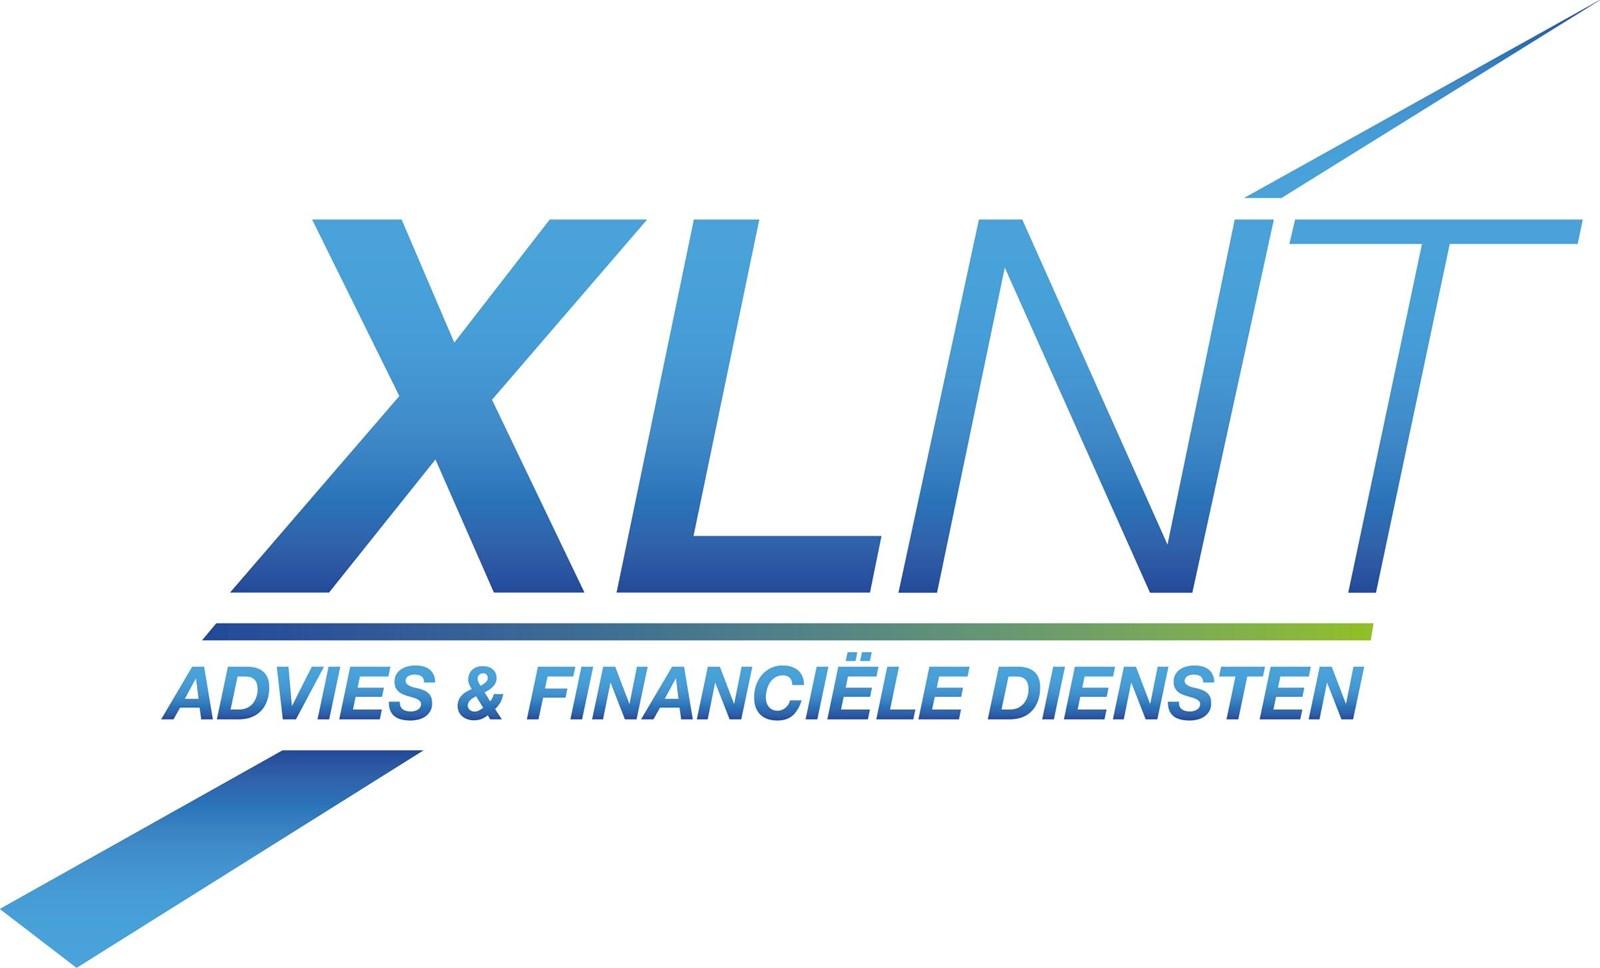 Logo van XLNT advies & financiële dienstverlening